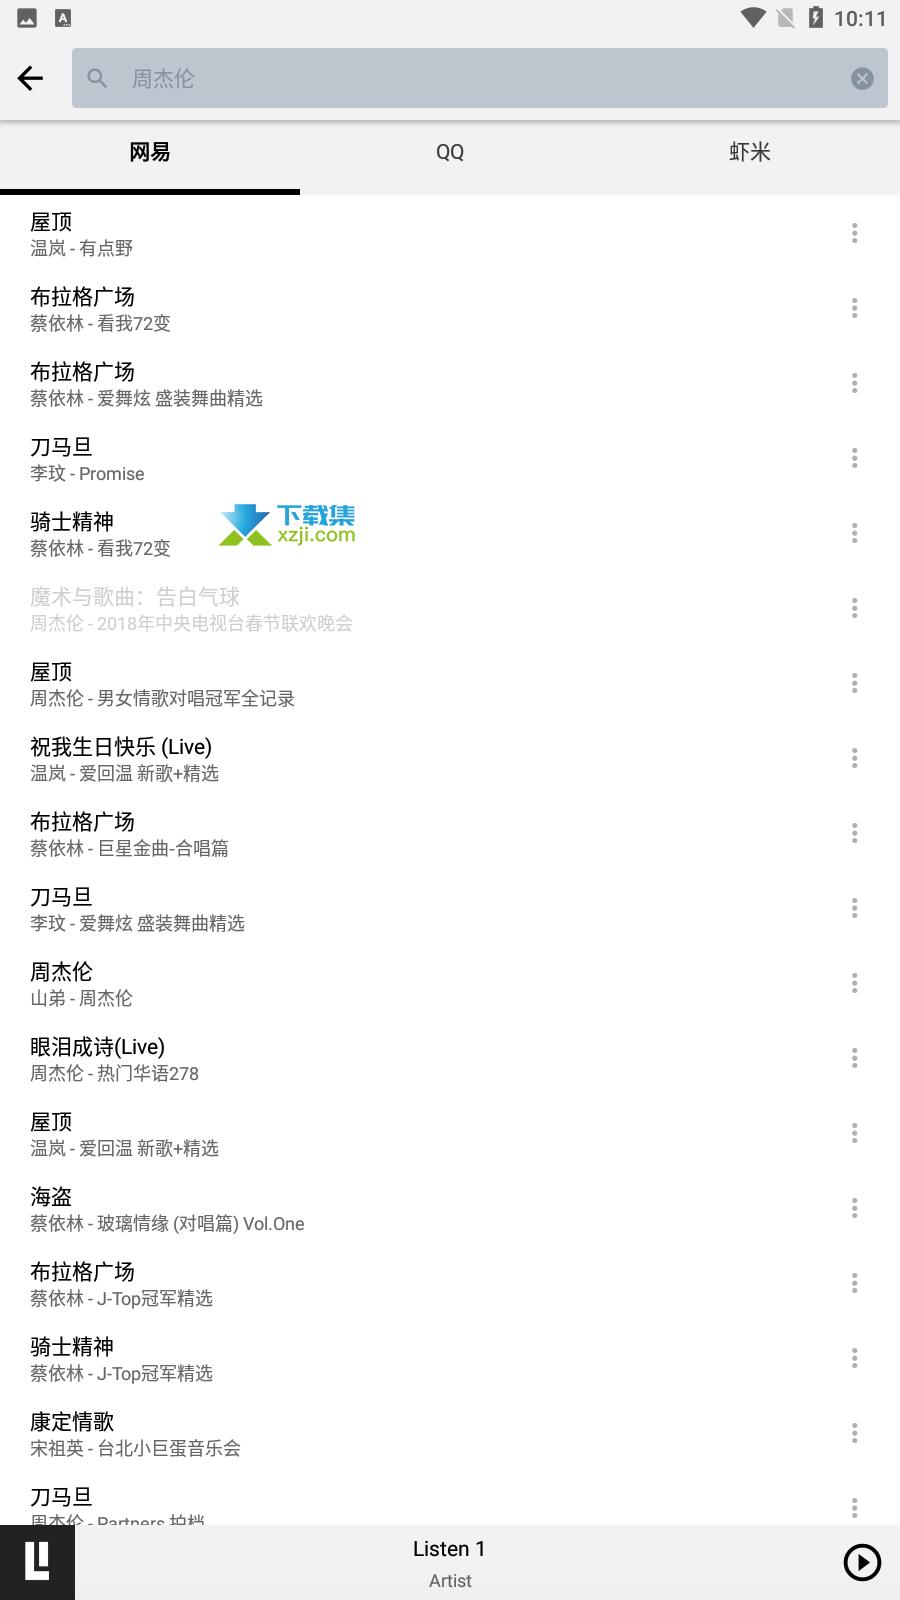 listen1安卓版界面3